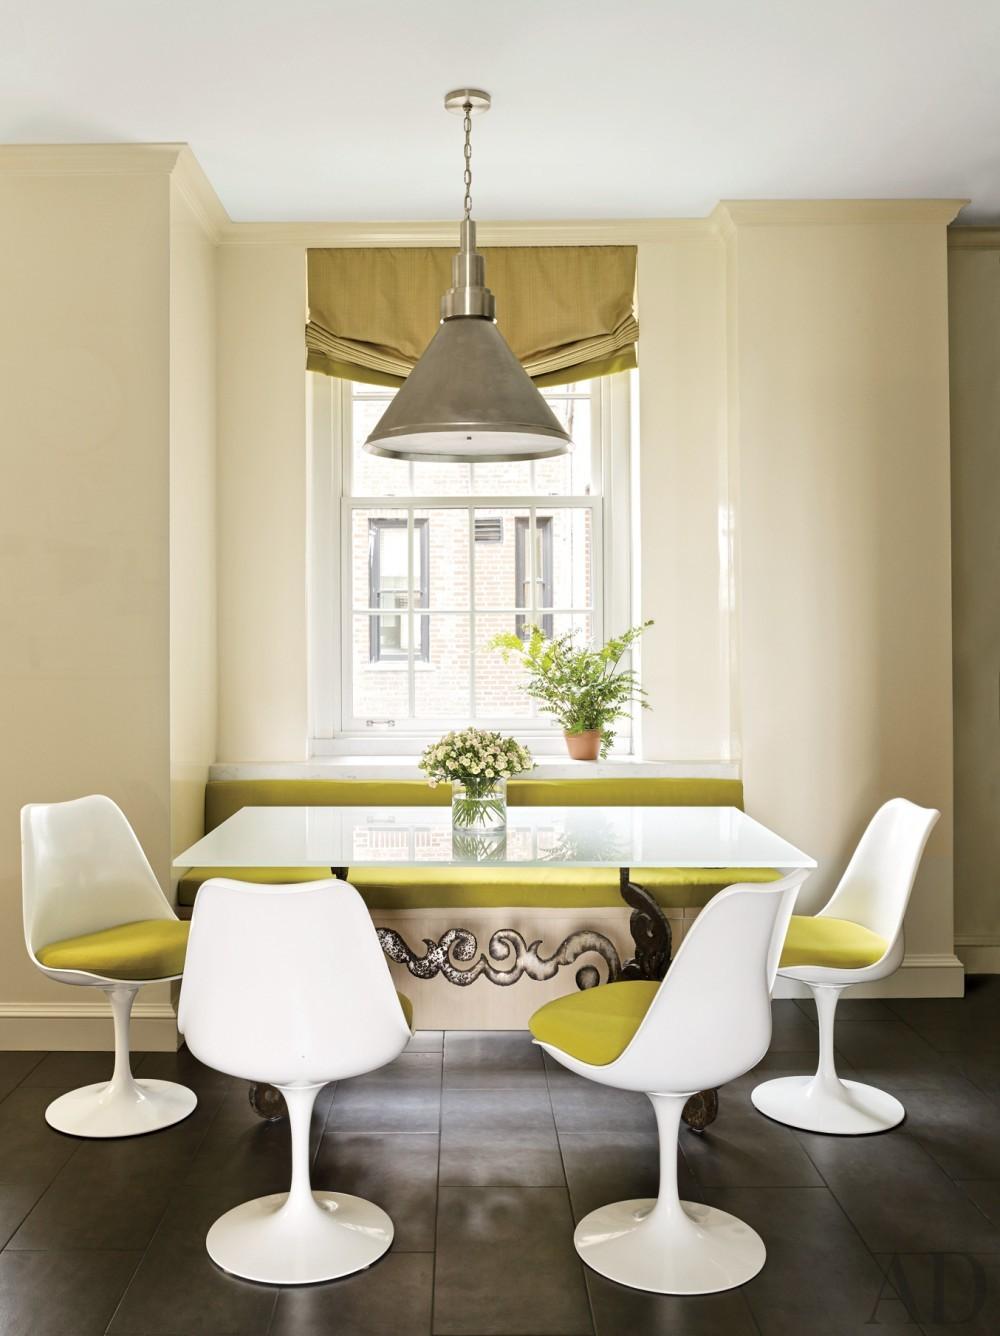 Modern Dining Room by Stephen Sills Associates and John B. Murray Architect in New York, New York